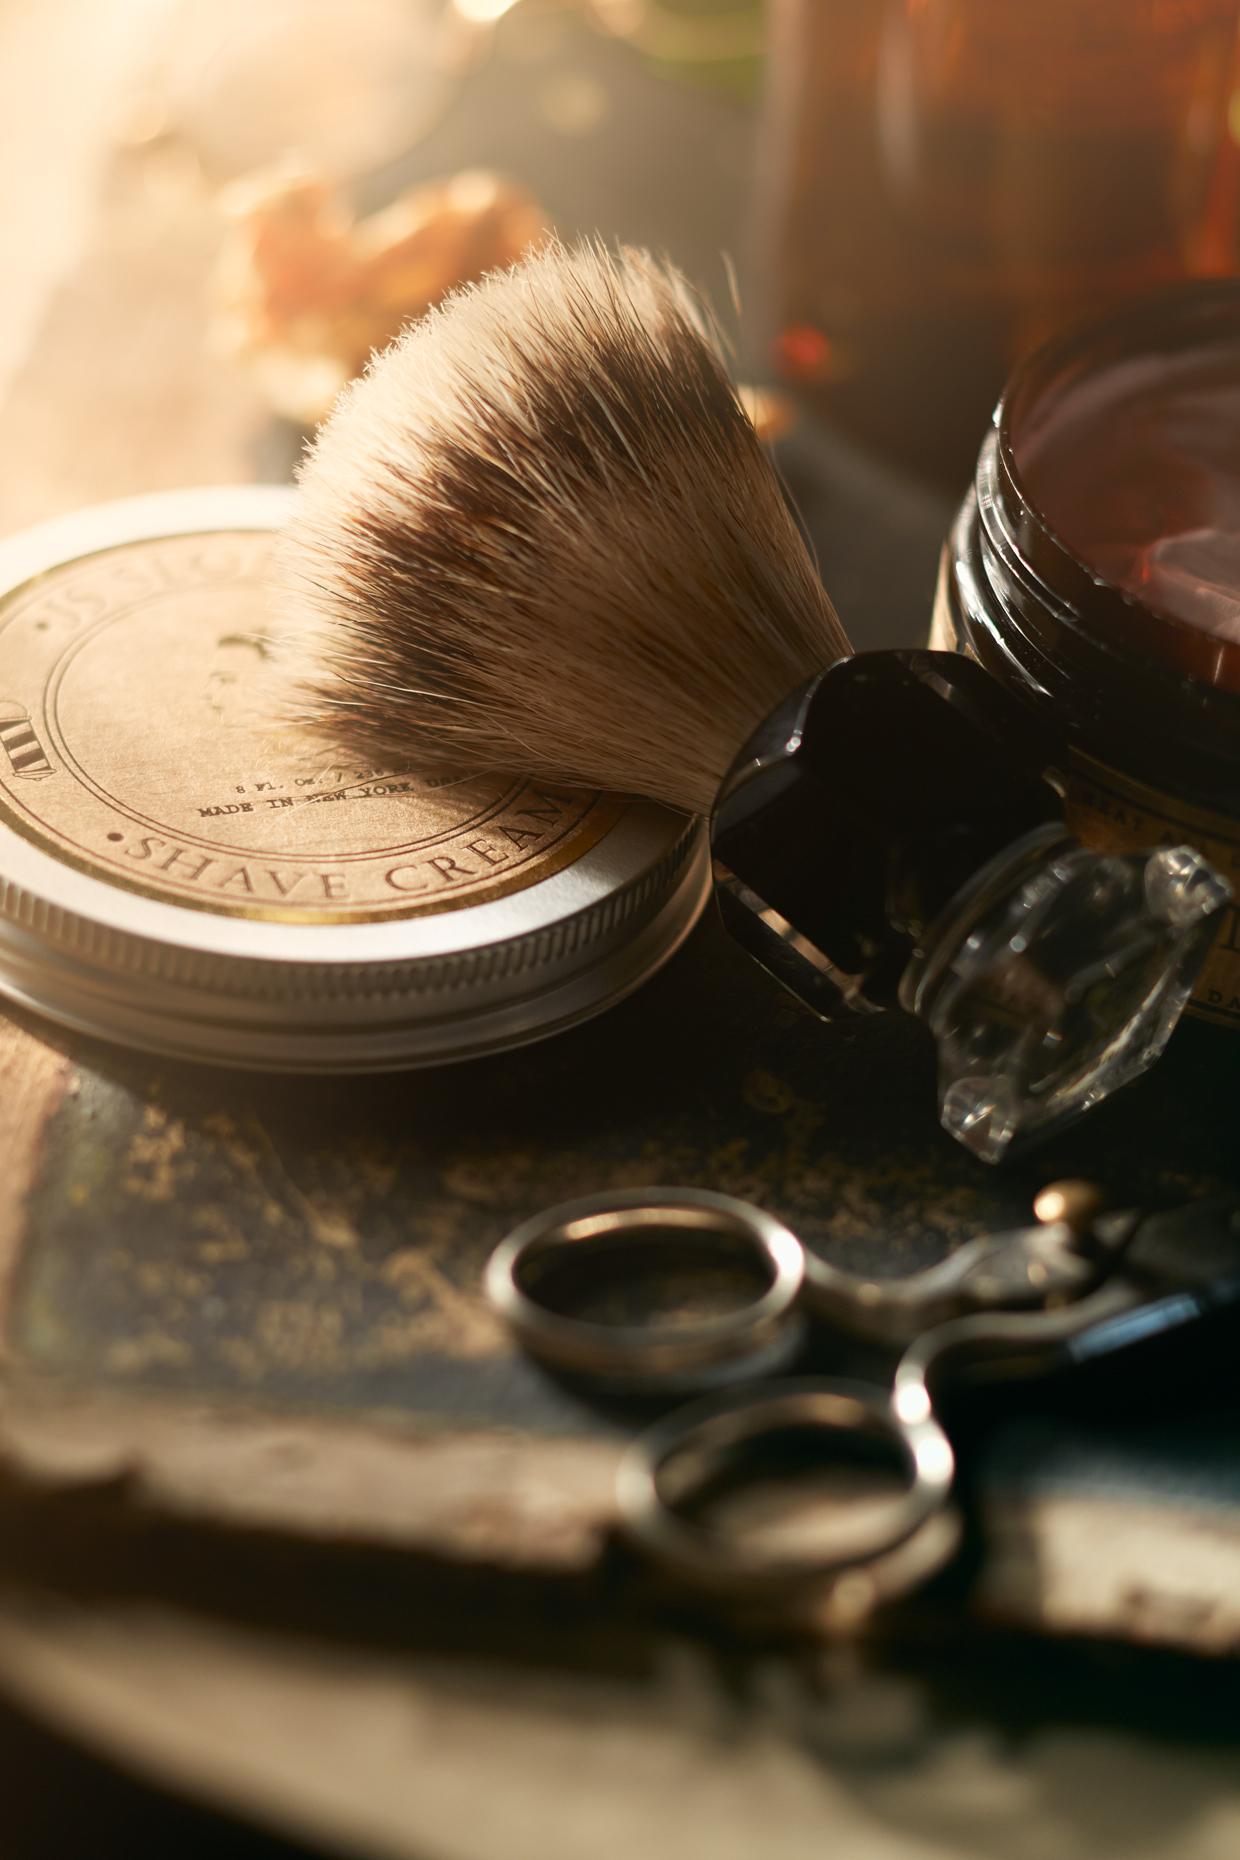 Product Photography Still Life Derek Israelsen 001 Shaving Cream Top